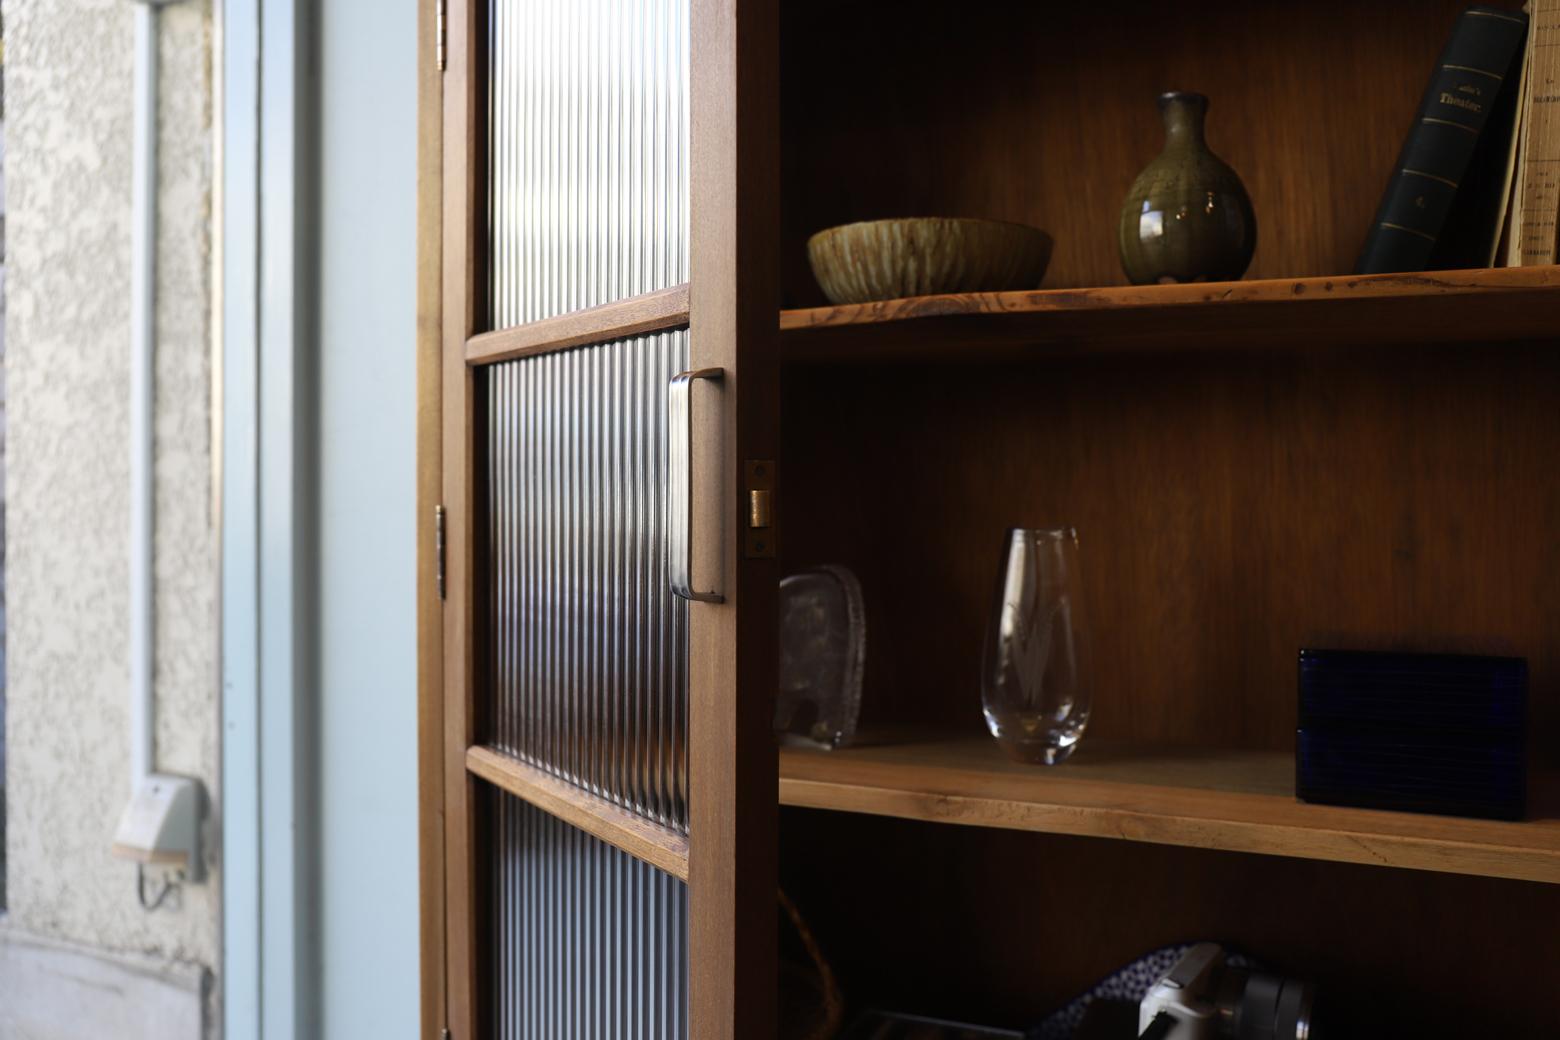 Antique Reeded Glass Cabinet Shelf/モールガラス キャビネット 本棚 食器棚 レトロ アンティーク 古道具